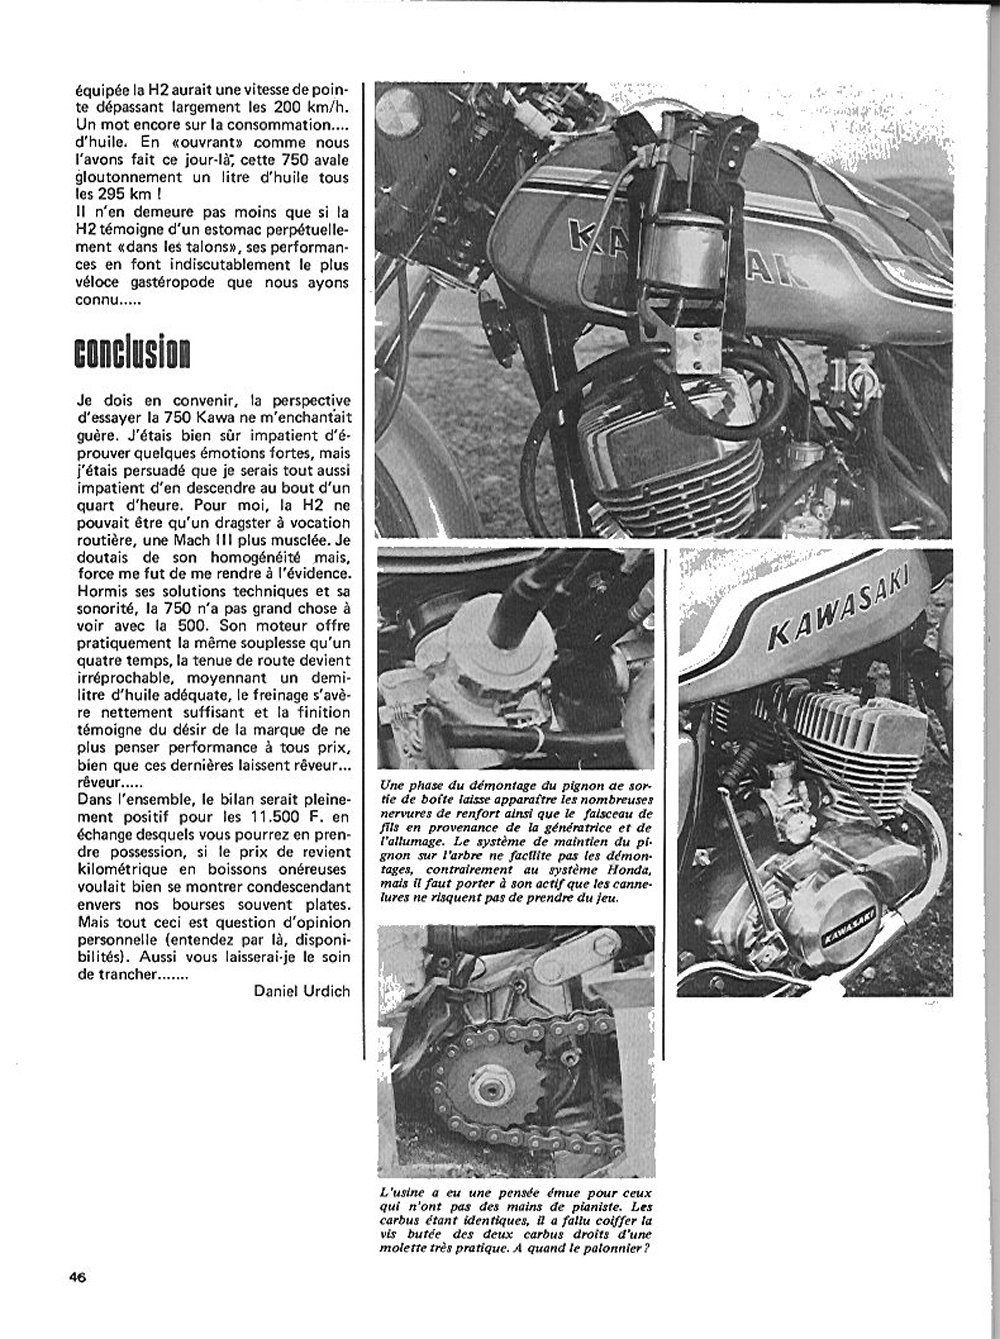 1972 Kawasaki H2 750 road test france 11.jpg